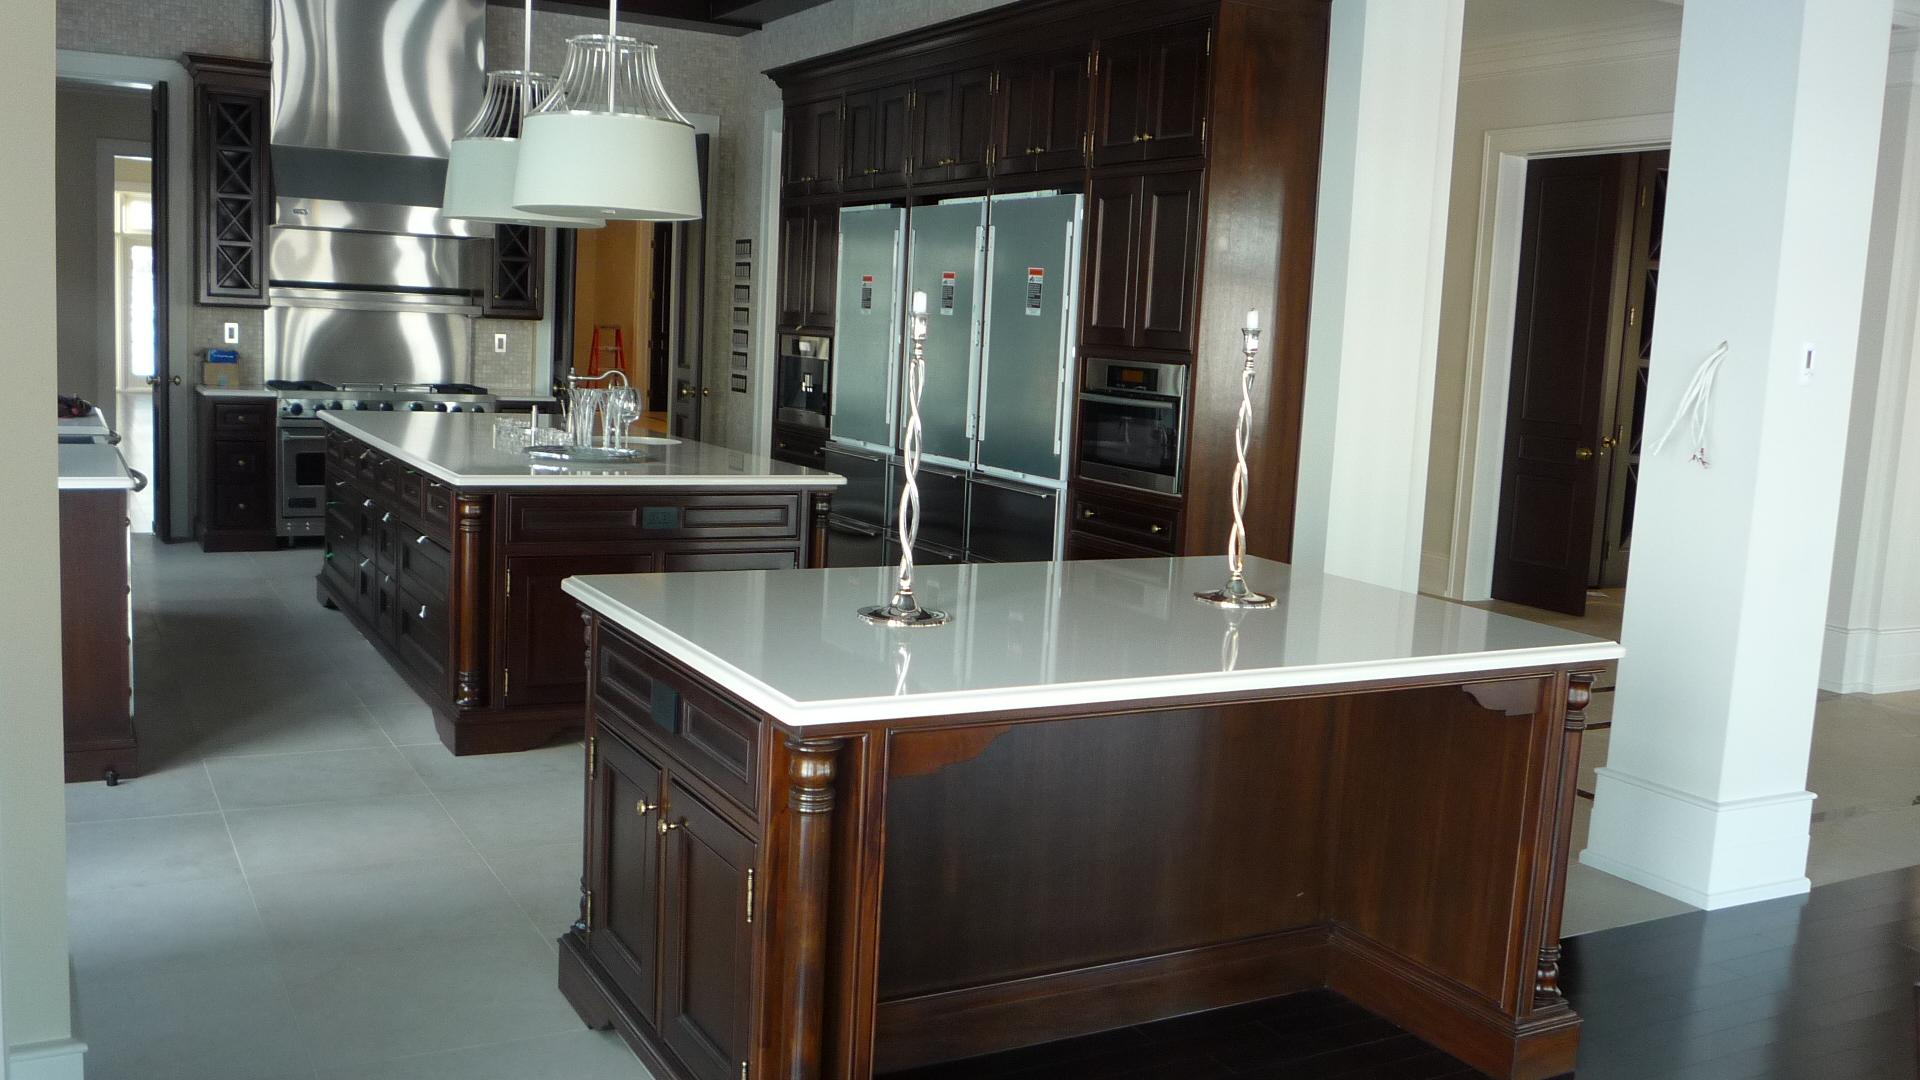 Kitchen Quartz Countertop Ceramic floor white ideas inspiration.jpg